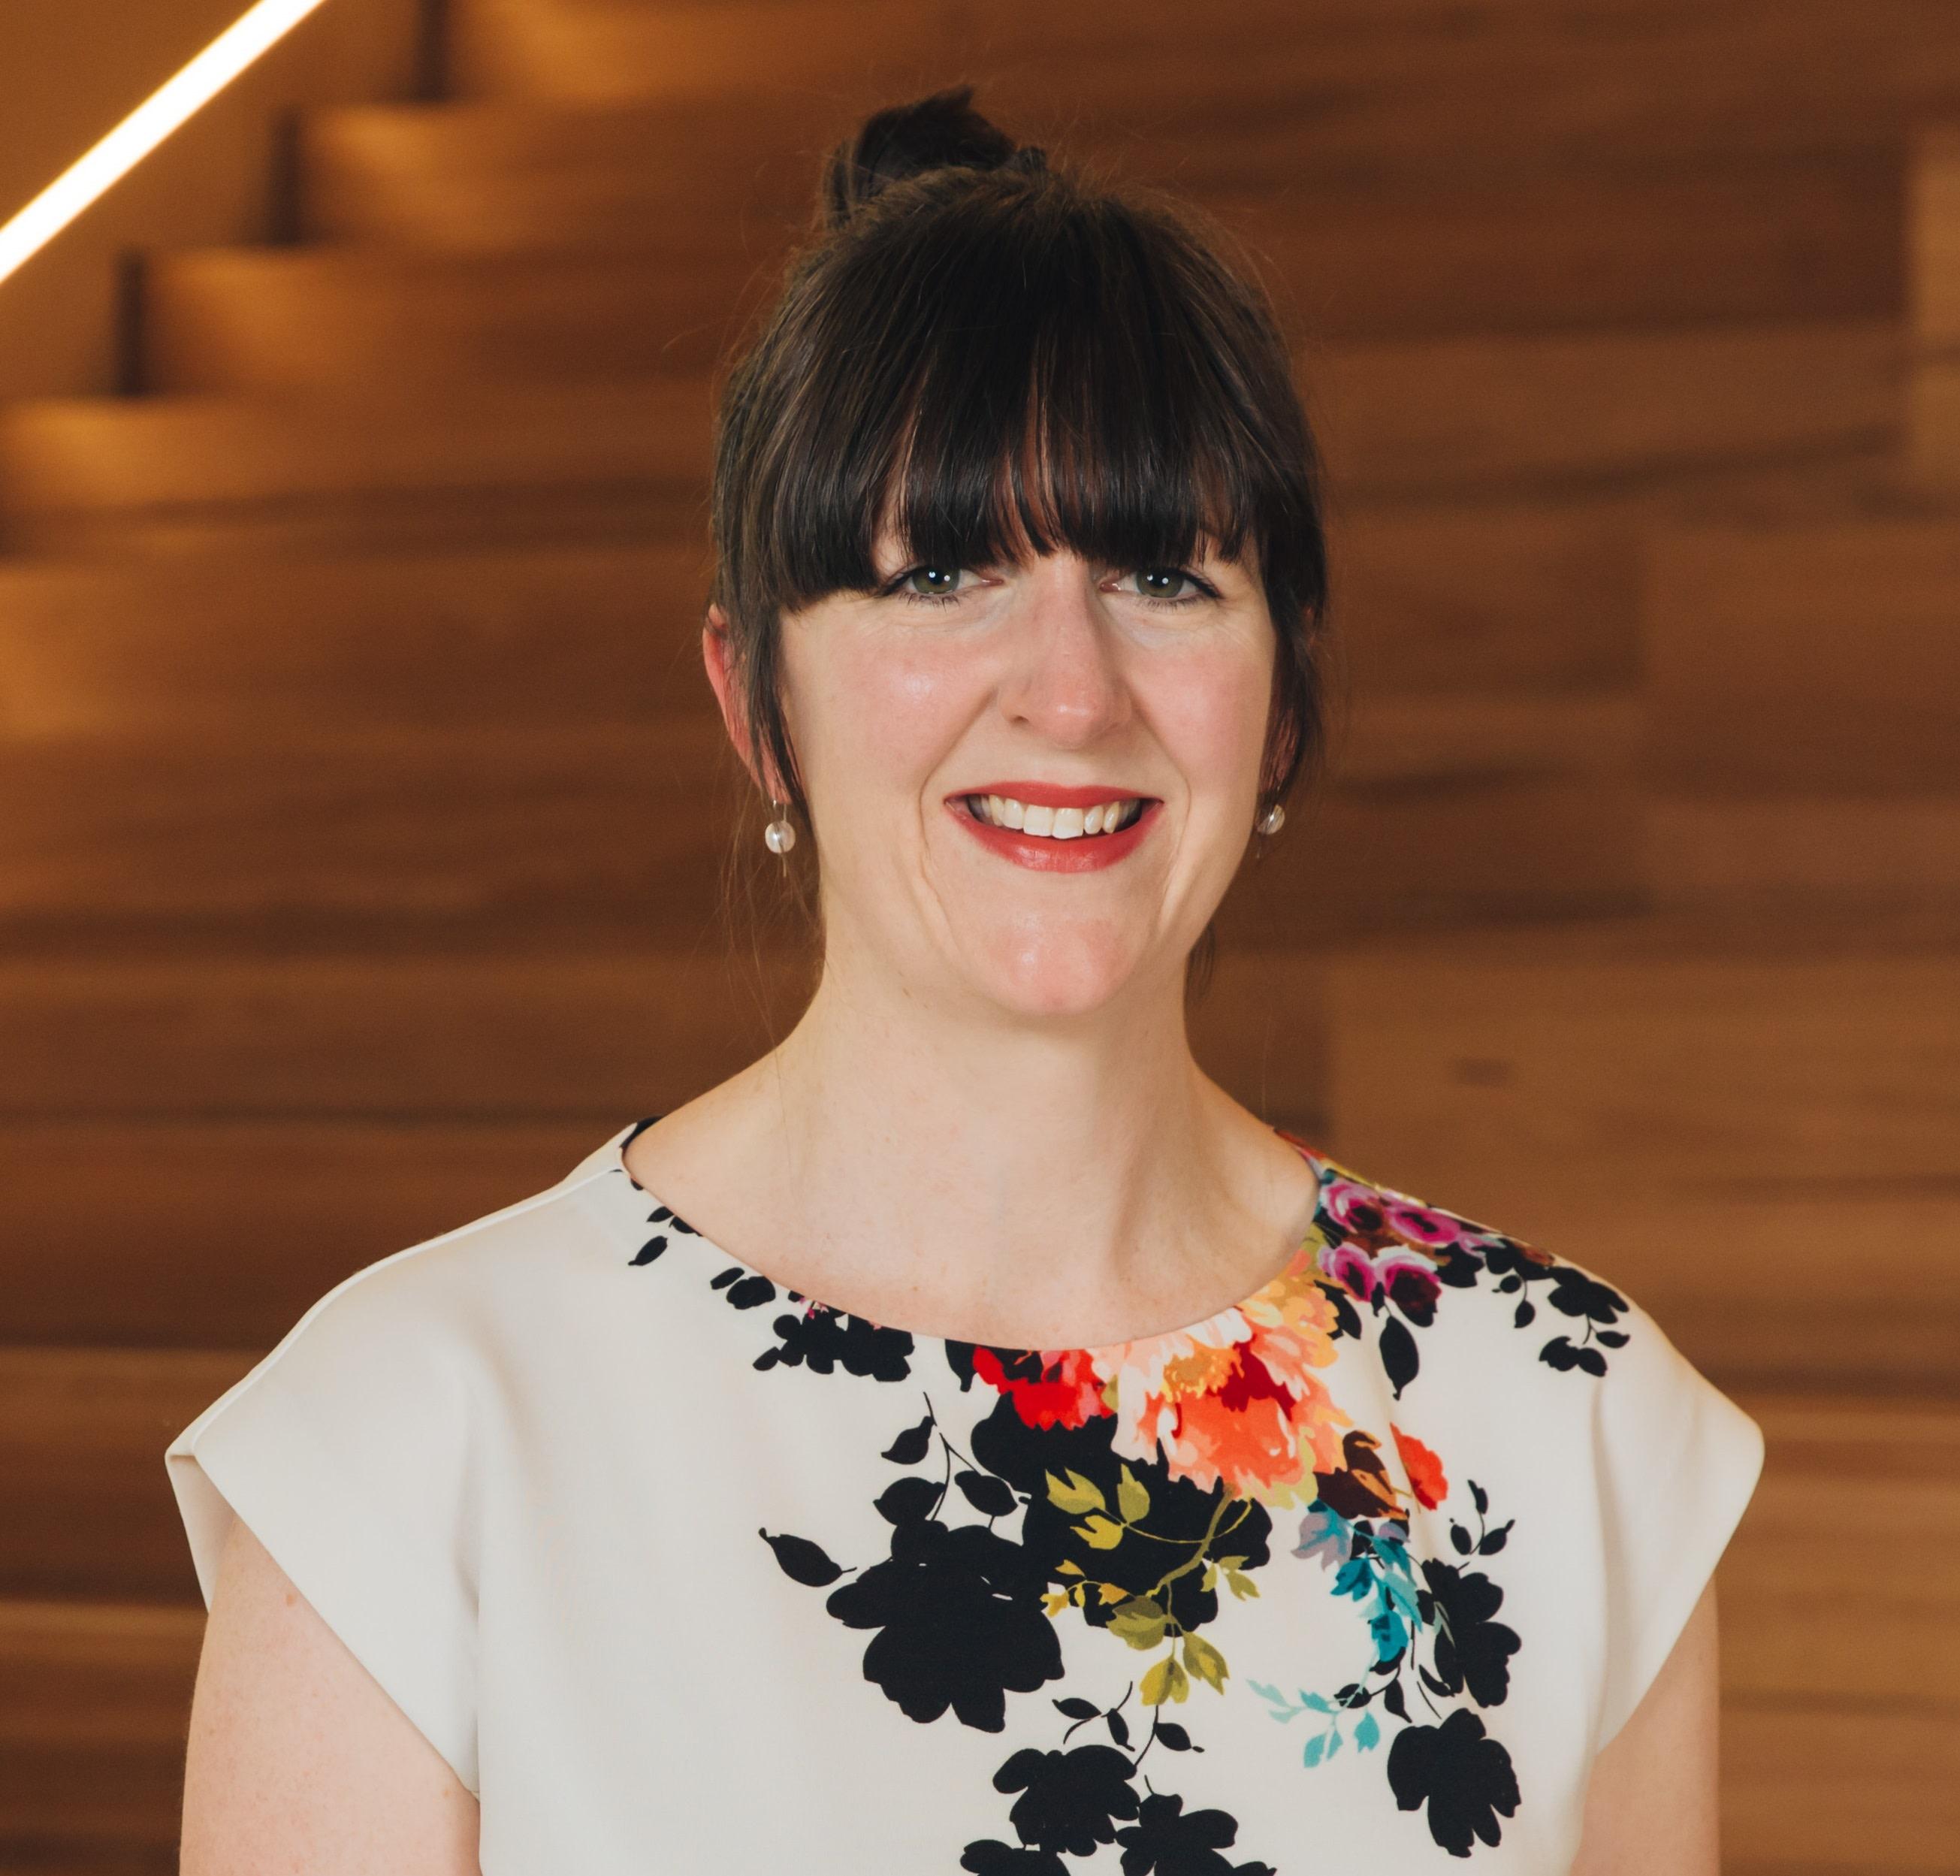 Associate Professor Genevieve Grant